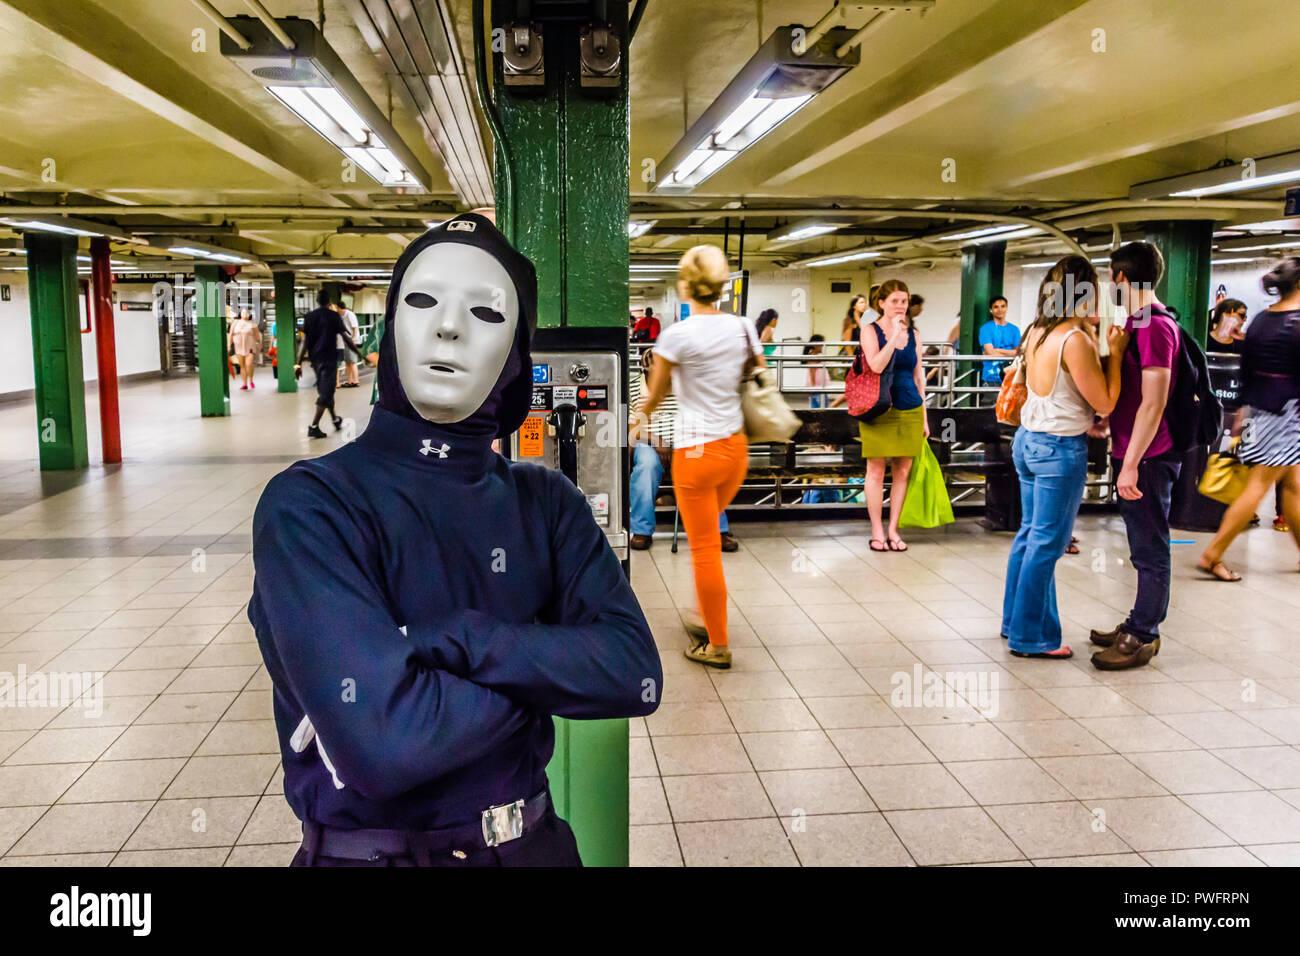 Mime 14th Street – Union Square Subway Station Manhattan _ New York, New York, USA - Stock Image